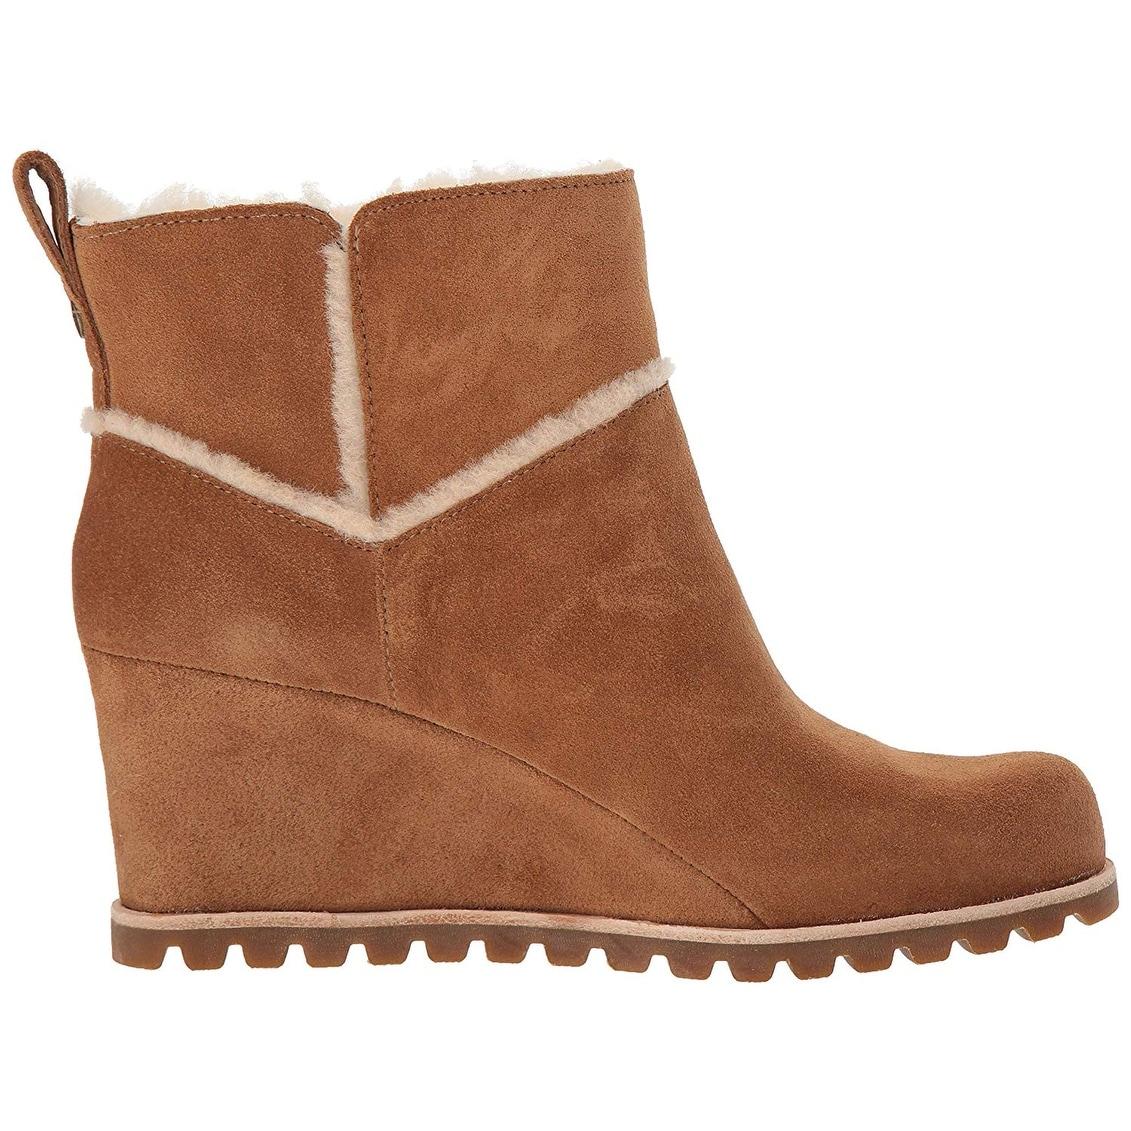 10f15ae0004 UGG Women's W Marte Boot - 6.5